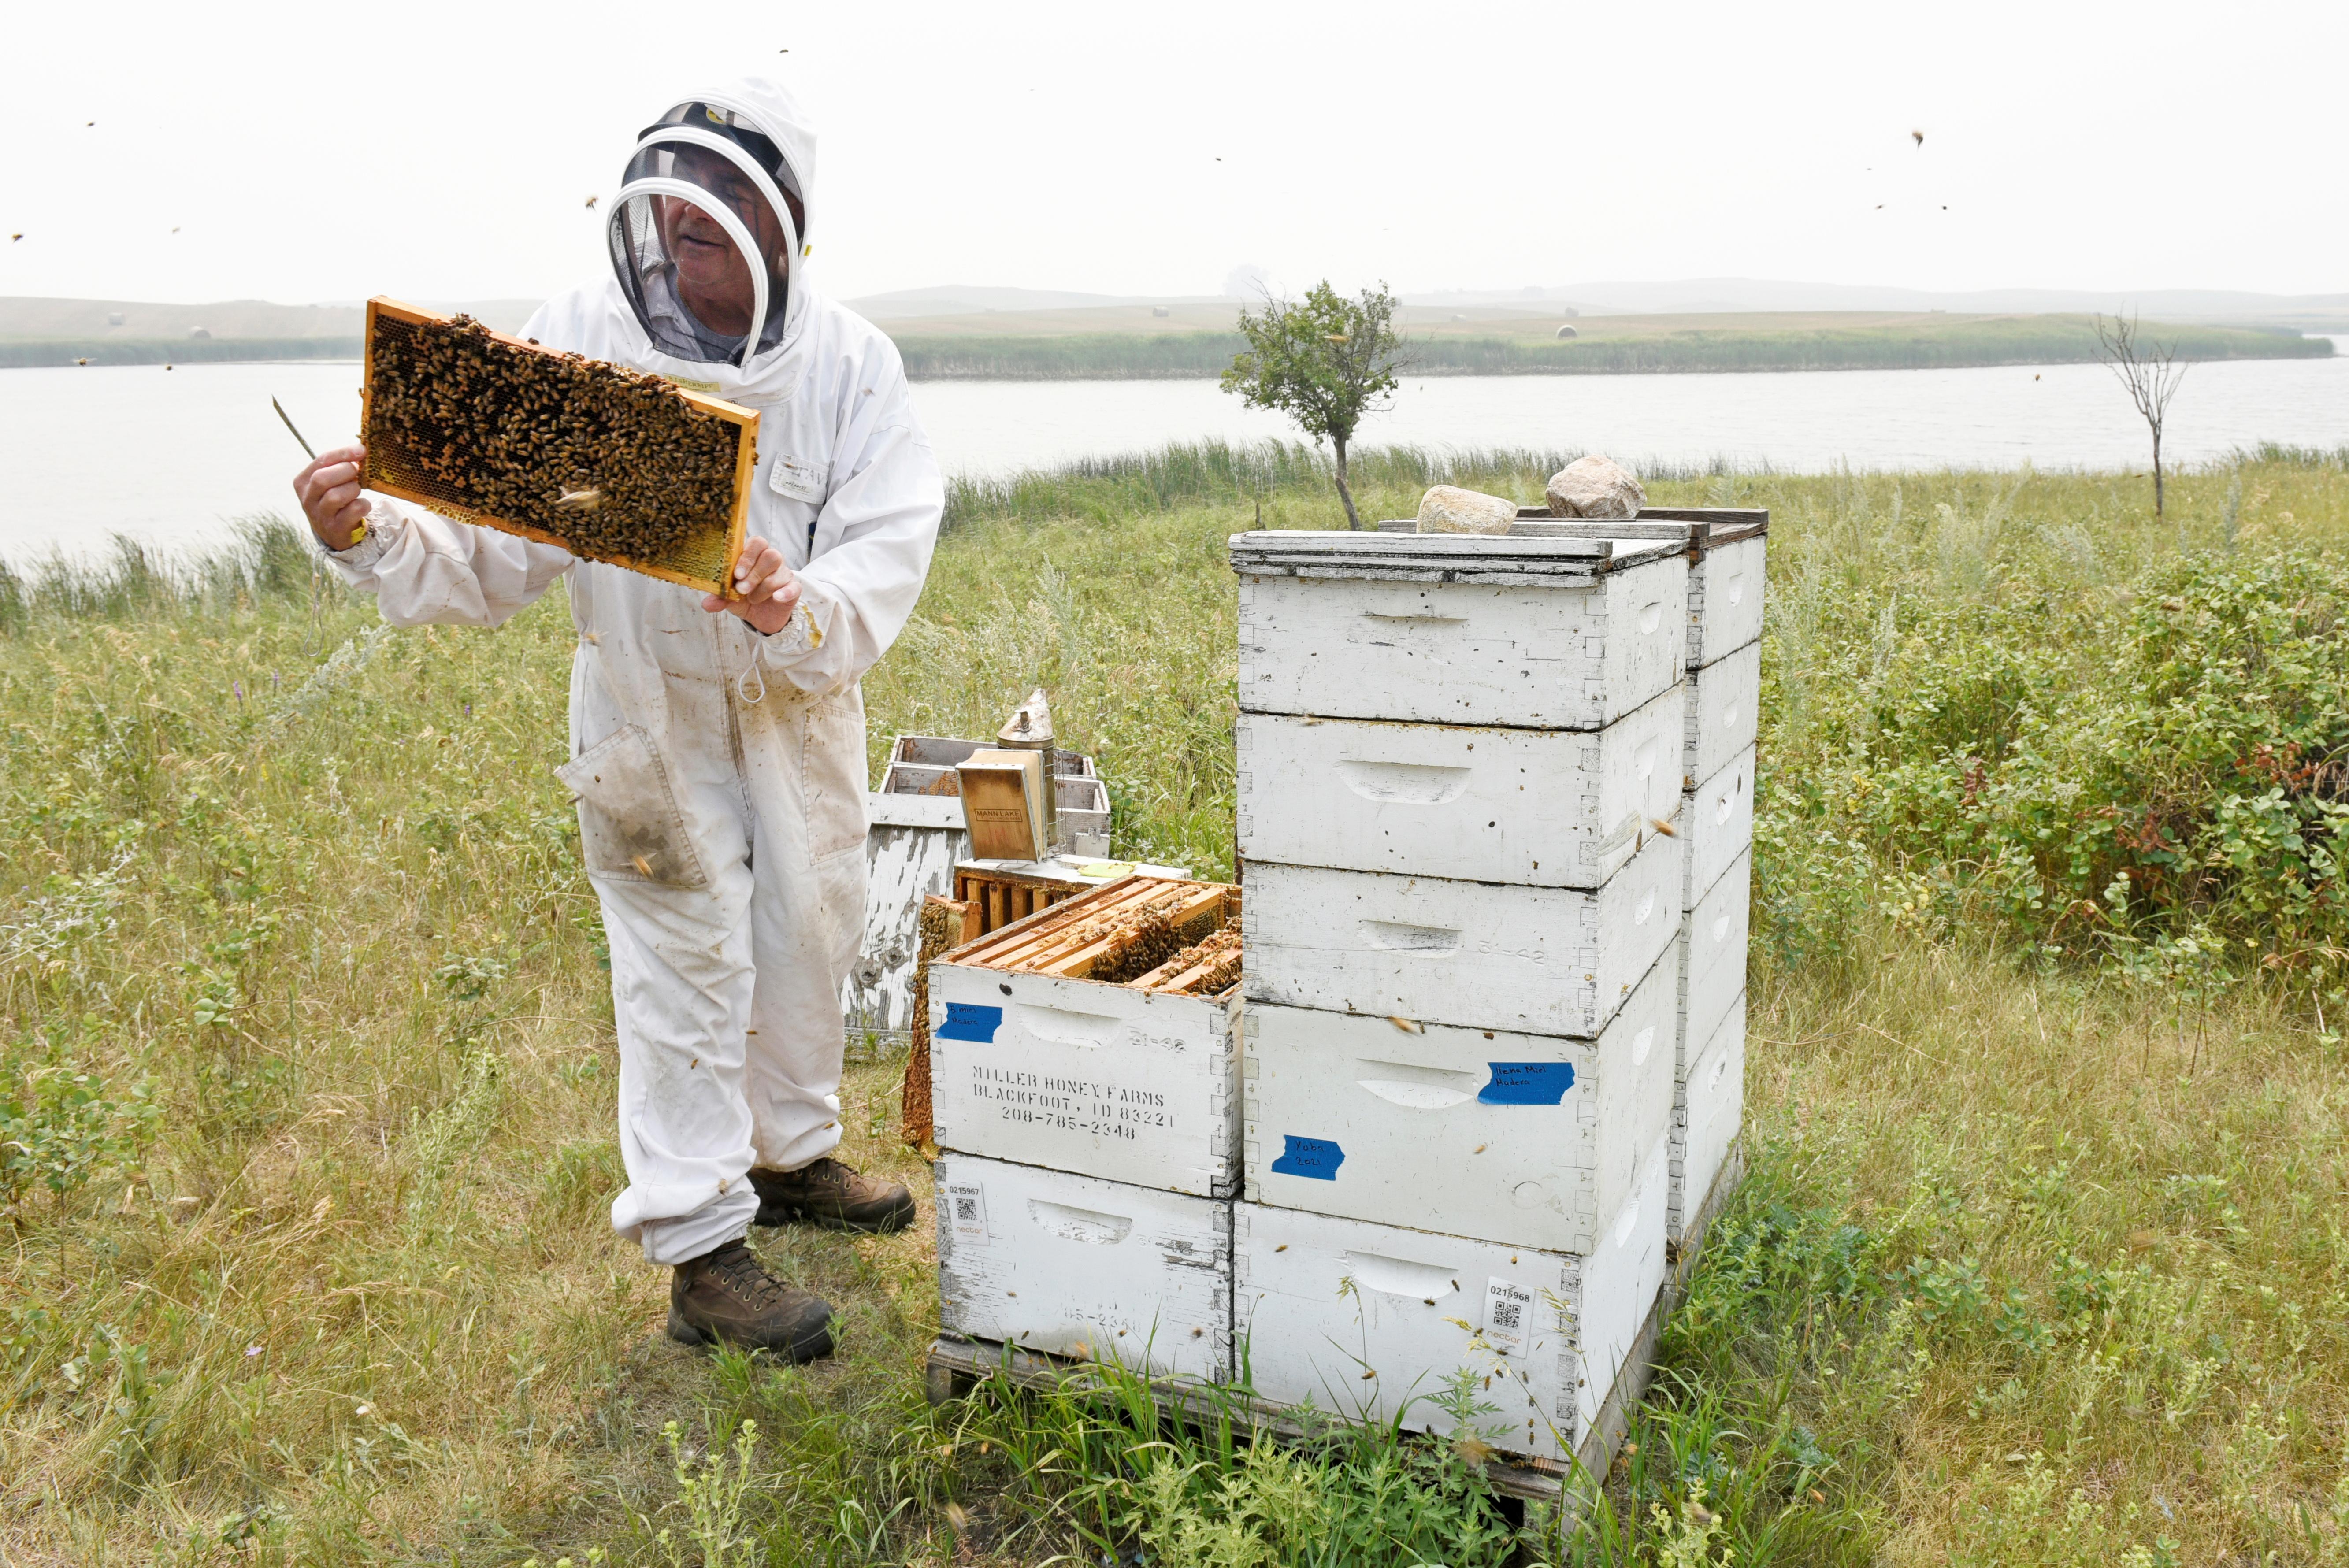 John Miller, owner of Miller Honey Farms, inspects one of his bee colonies in Gackle, North Dakota, U.S. July 30, 2021.  Drought-weakened bee colonies are producing a small honey crop in North Dakota, a major U.S. honey producer. REUTERS/Dan Koeck